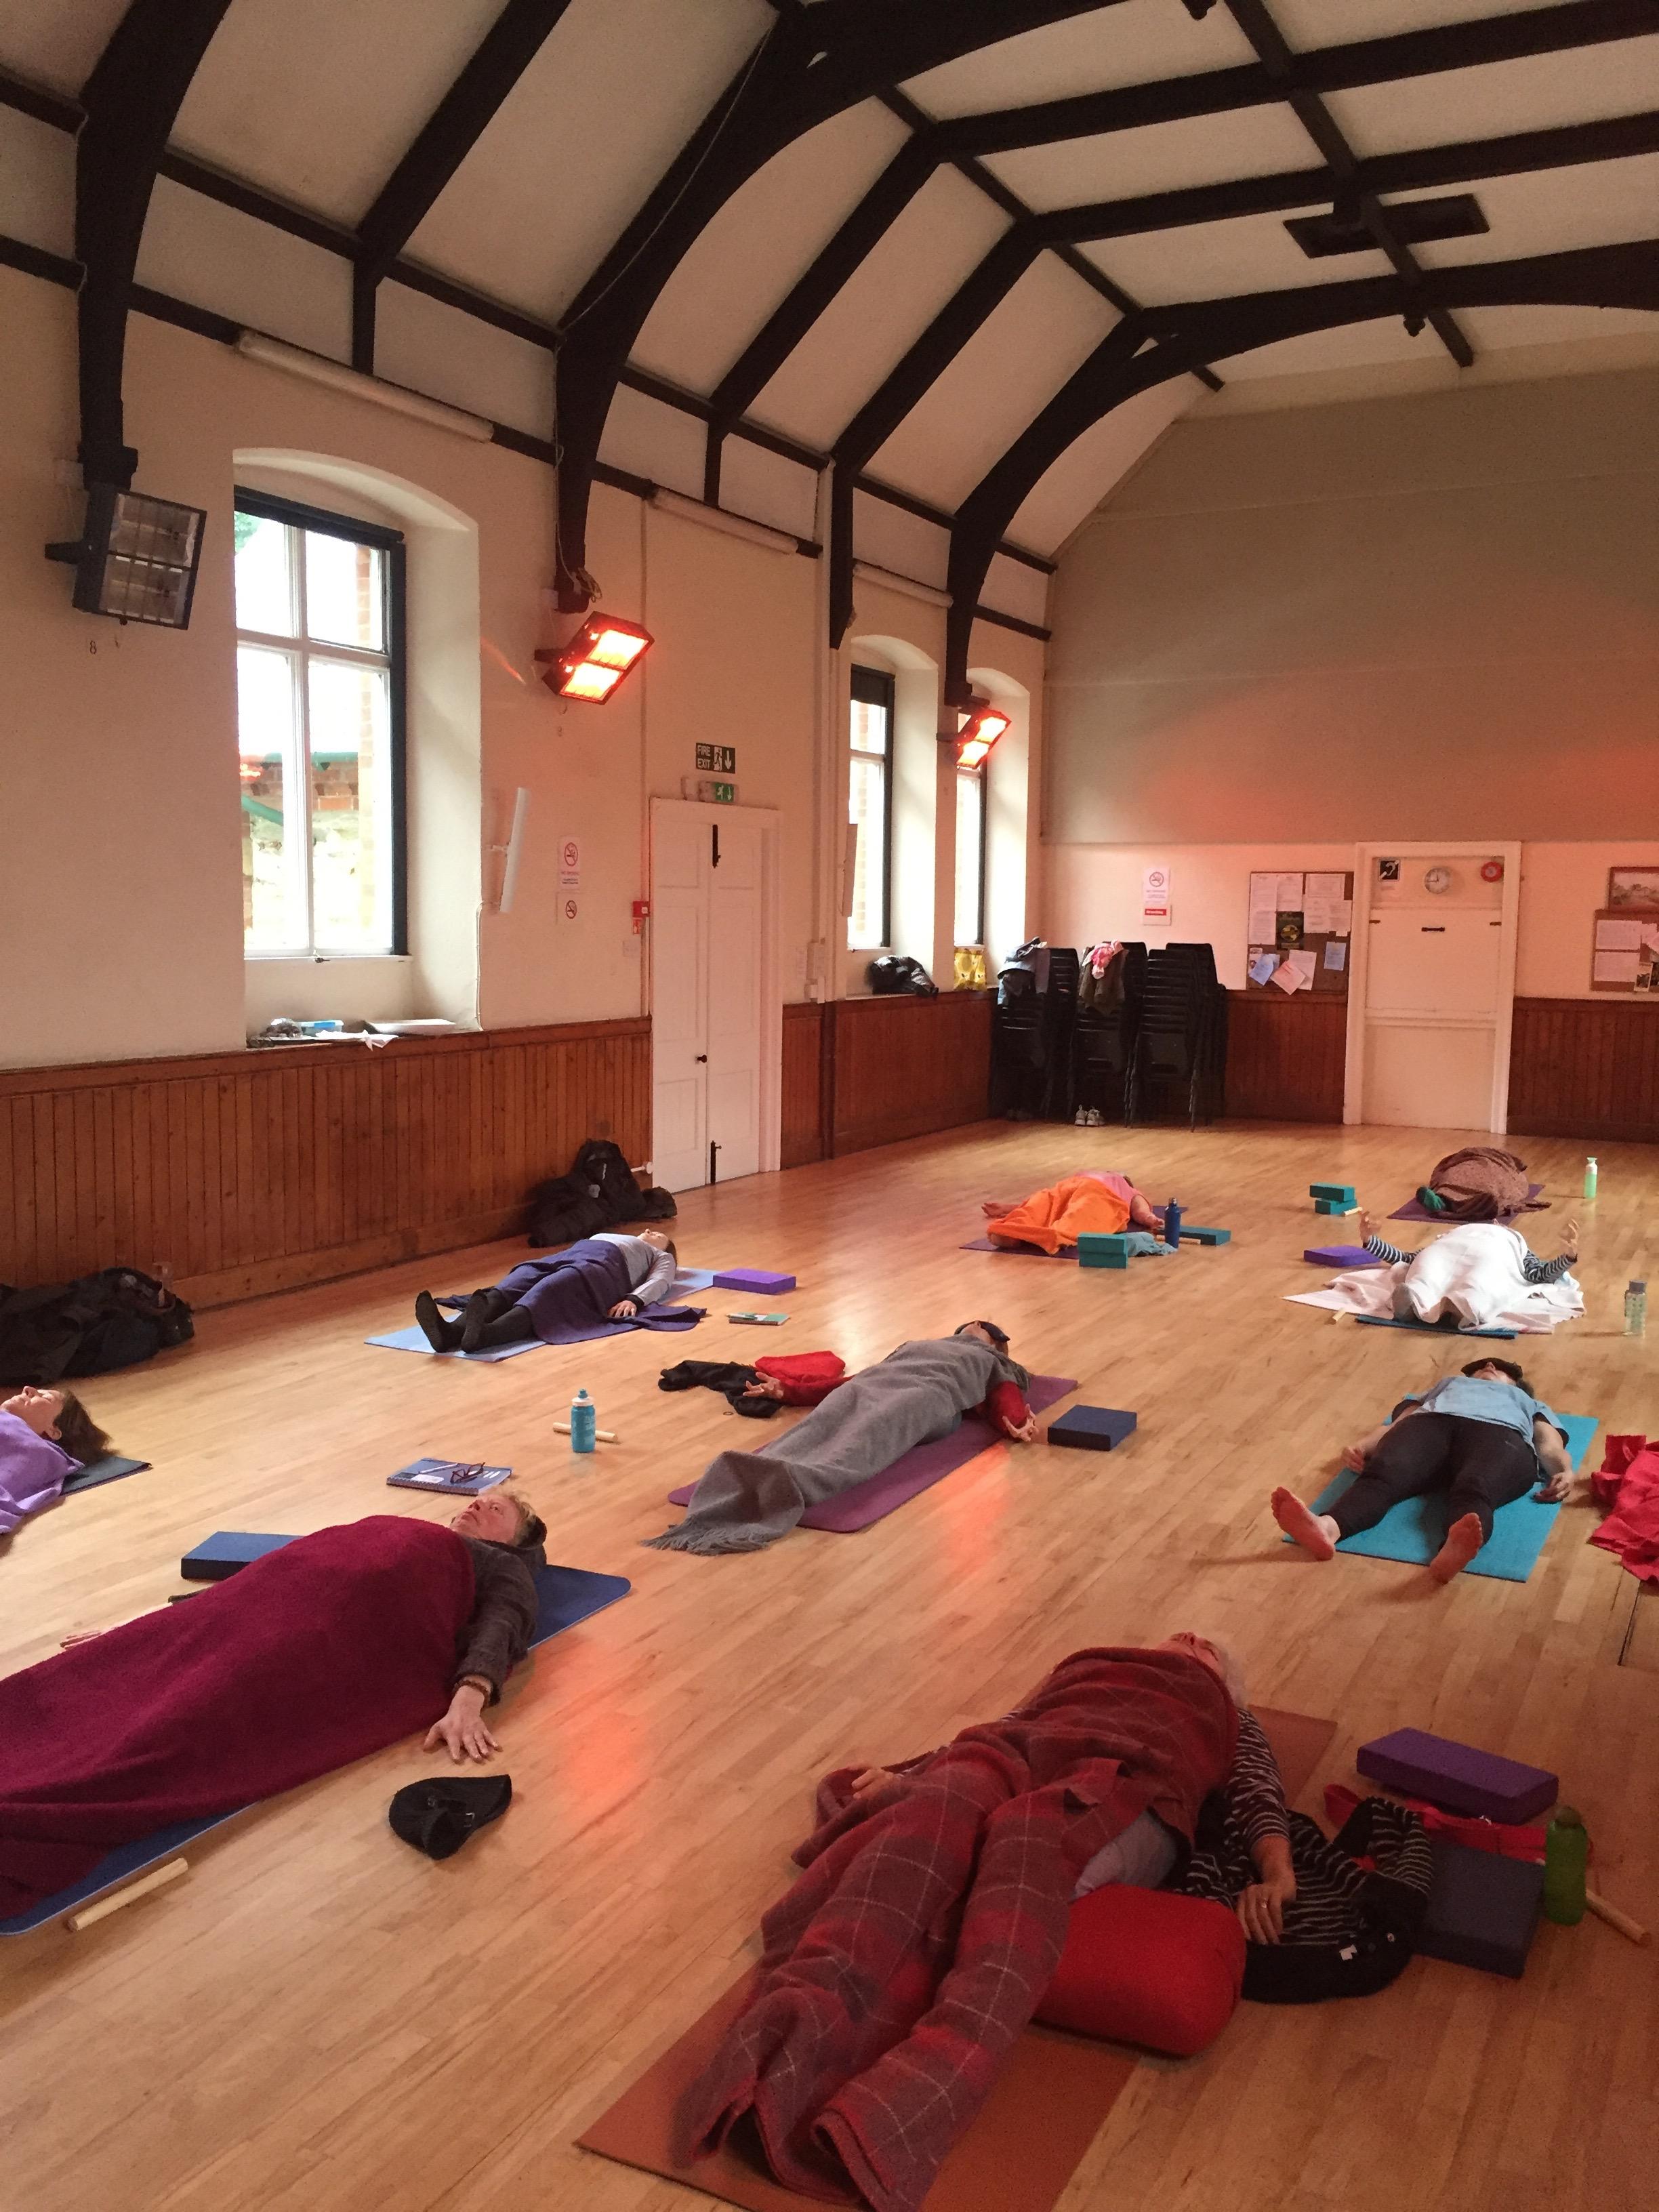 Yoga Home Practice Workshop - Next workshop February 2nd 2019.